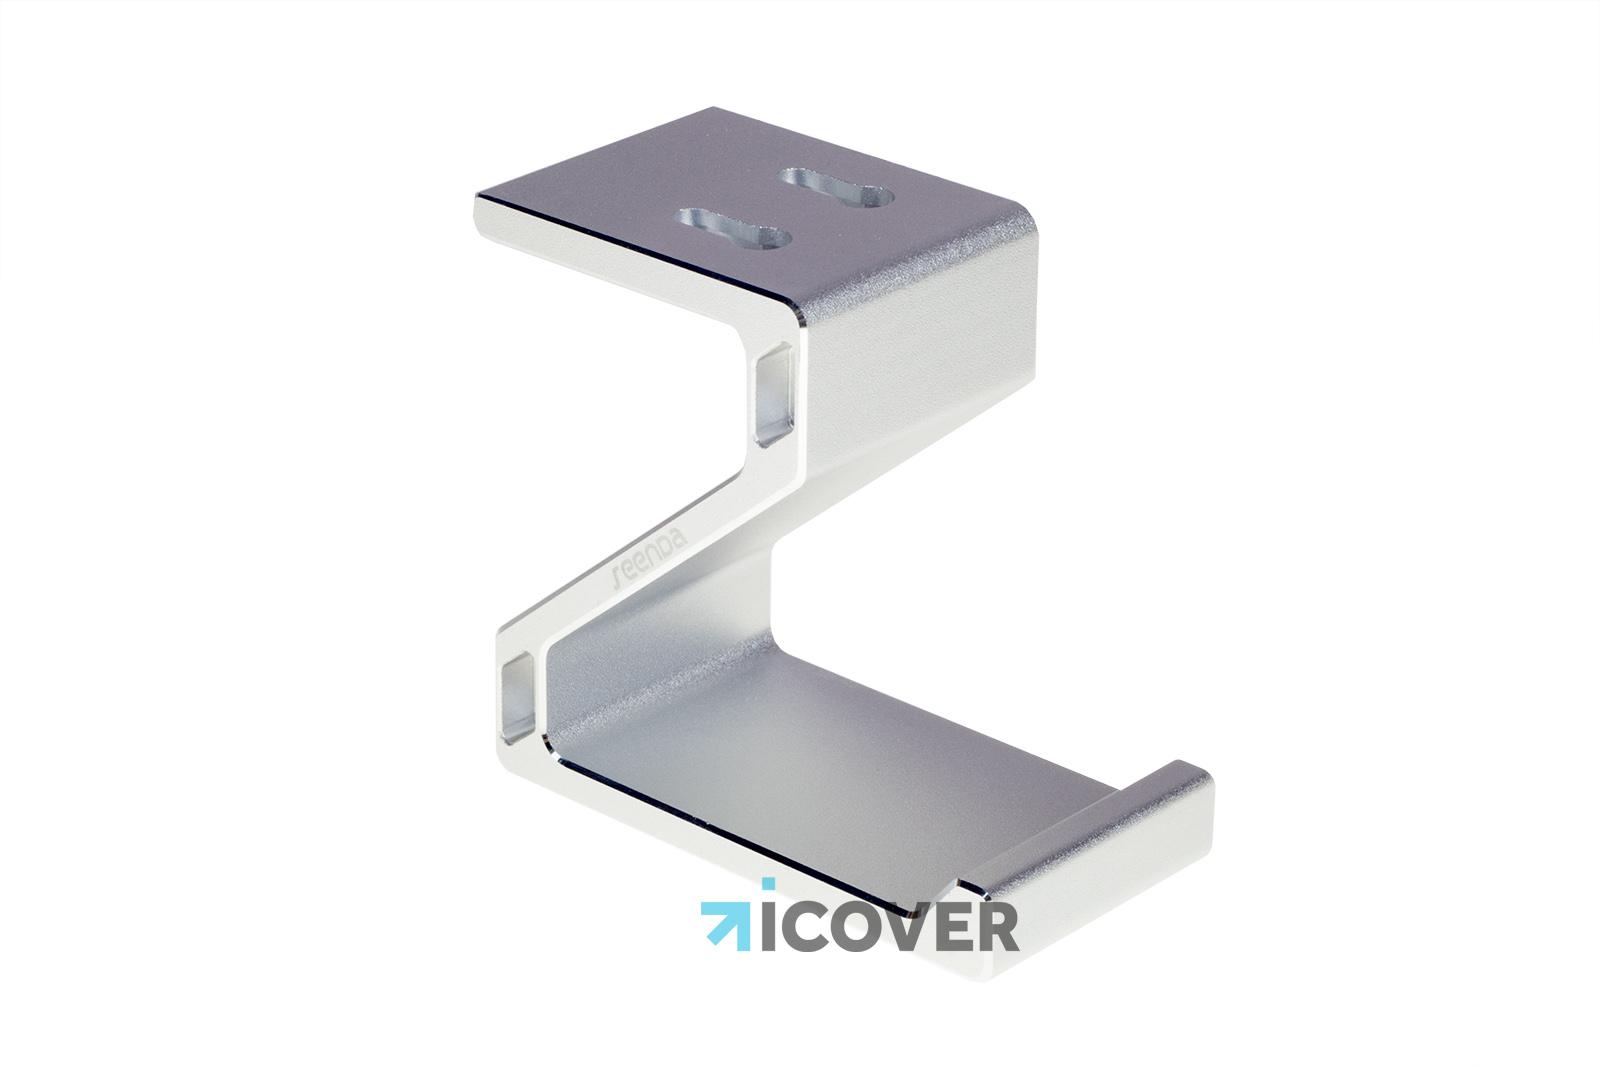 Seenda Alluminum Headhone Holder - держатель для наушников (Silver)